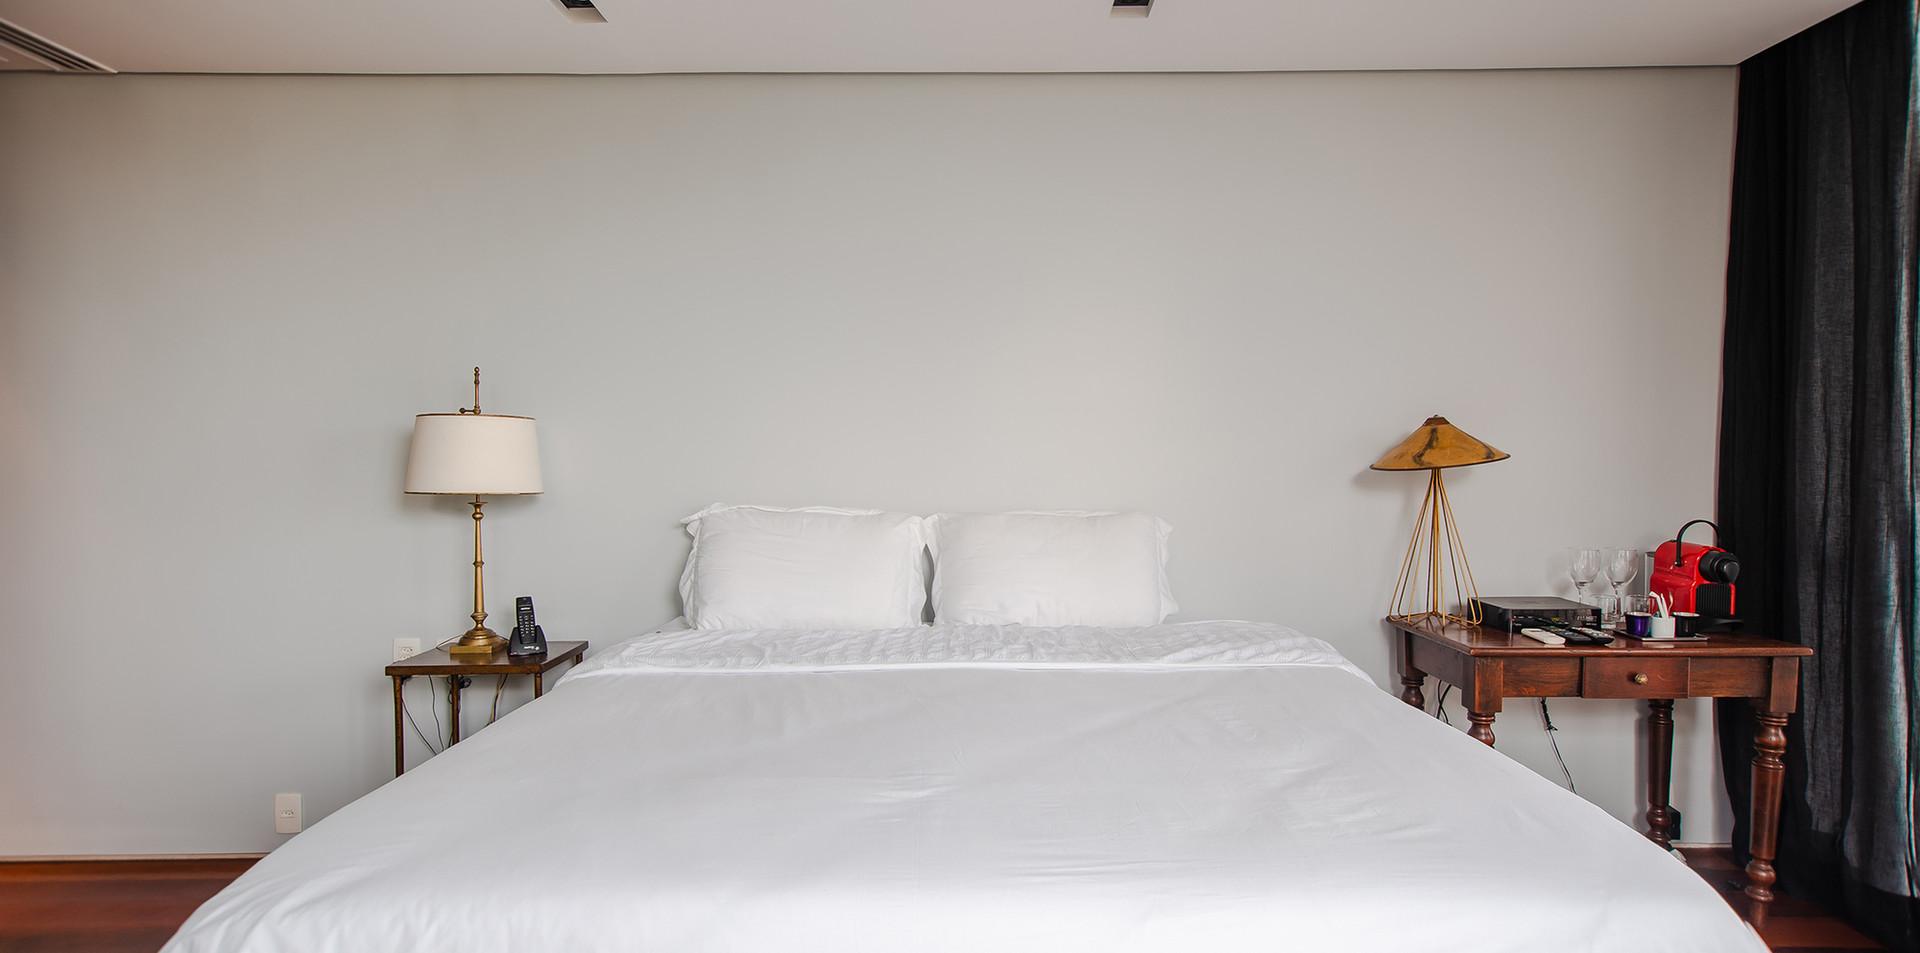 L'Homme de Rio Hotel - Suíte 8 Copacaban